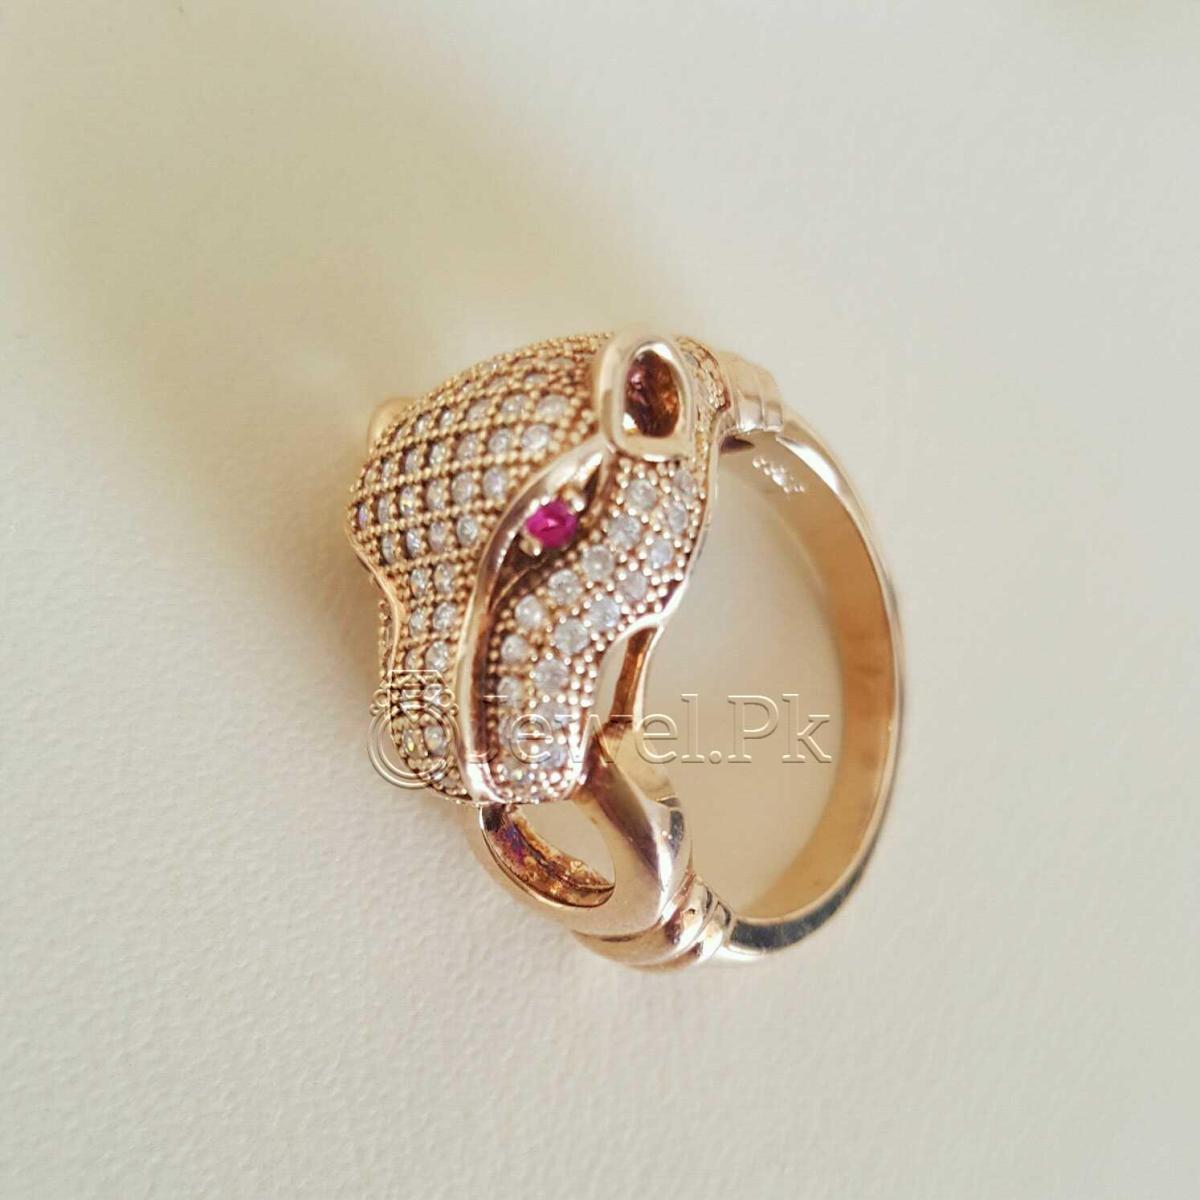 925 Silver Luxury Rings for Ladies Women Silver Rings Woman Handmade Rings 8 natural gemstones pakistan + 925 silver jewelry online